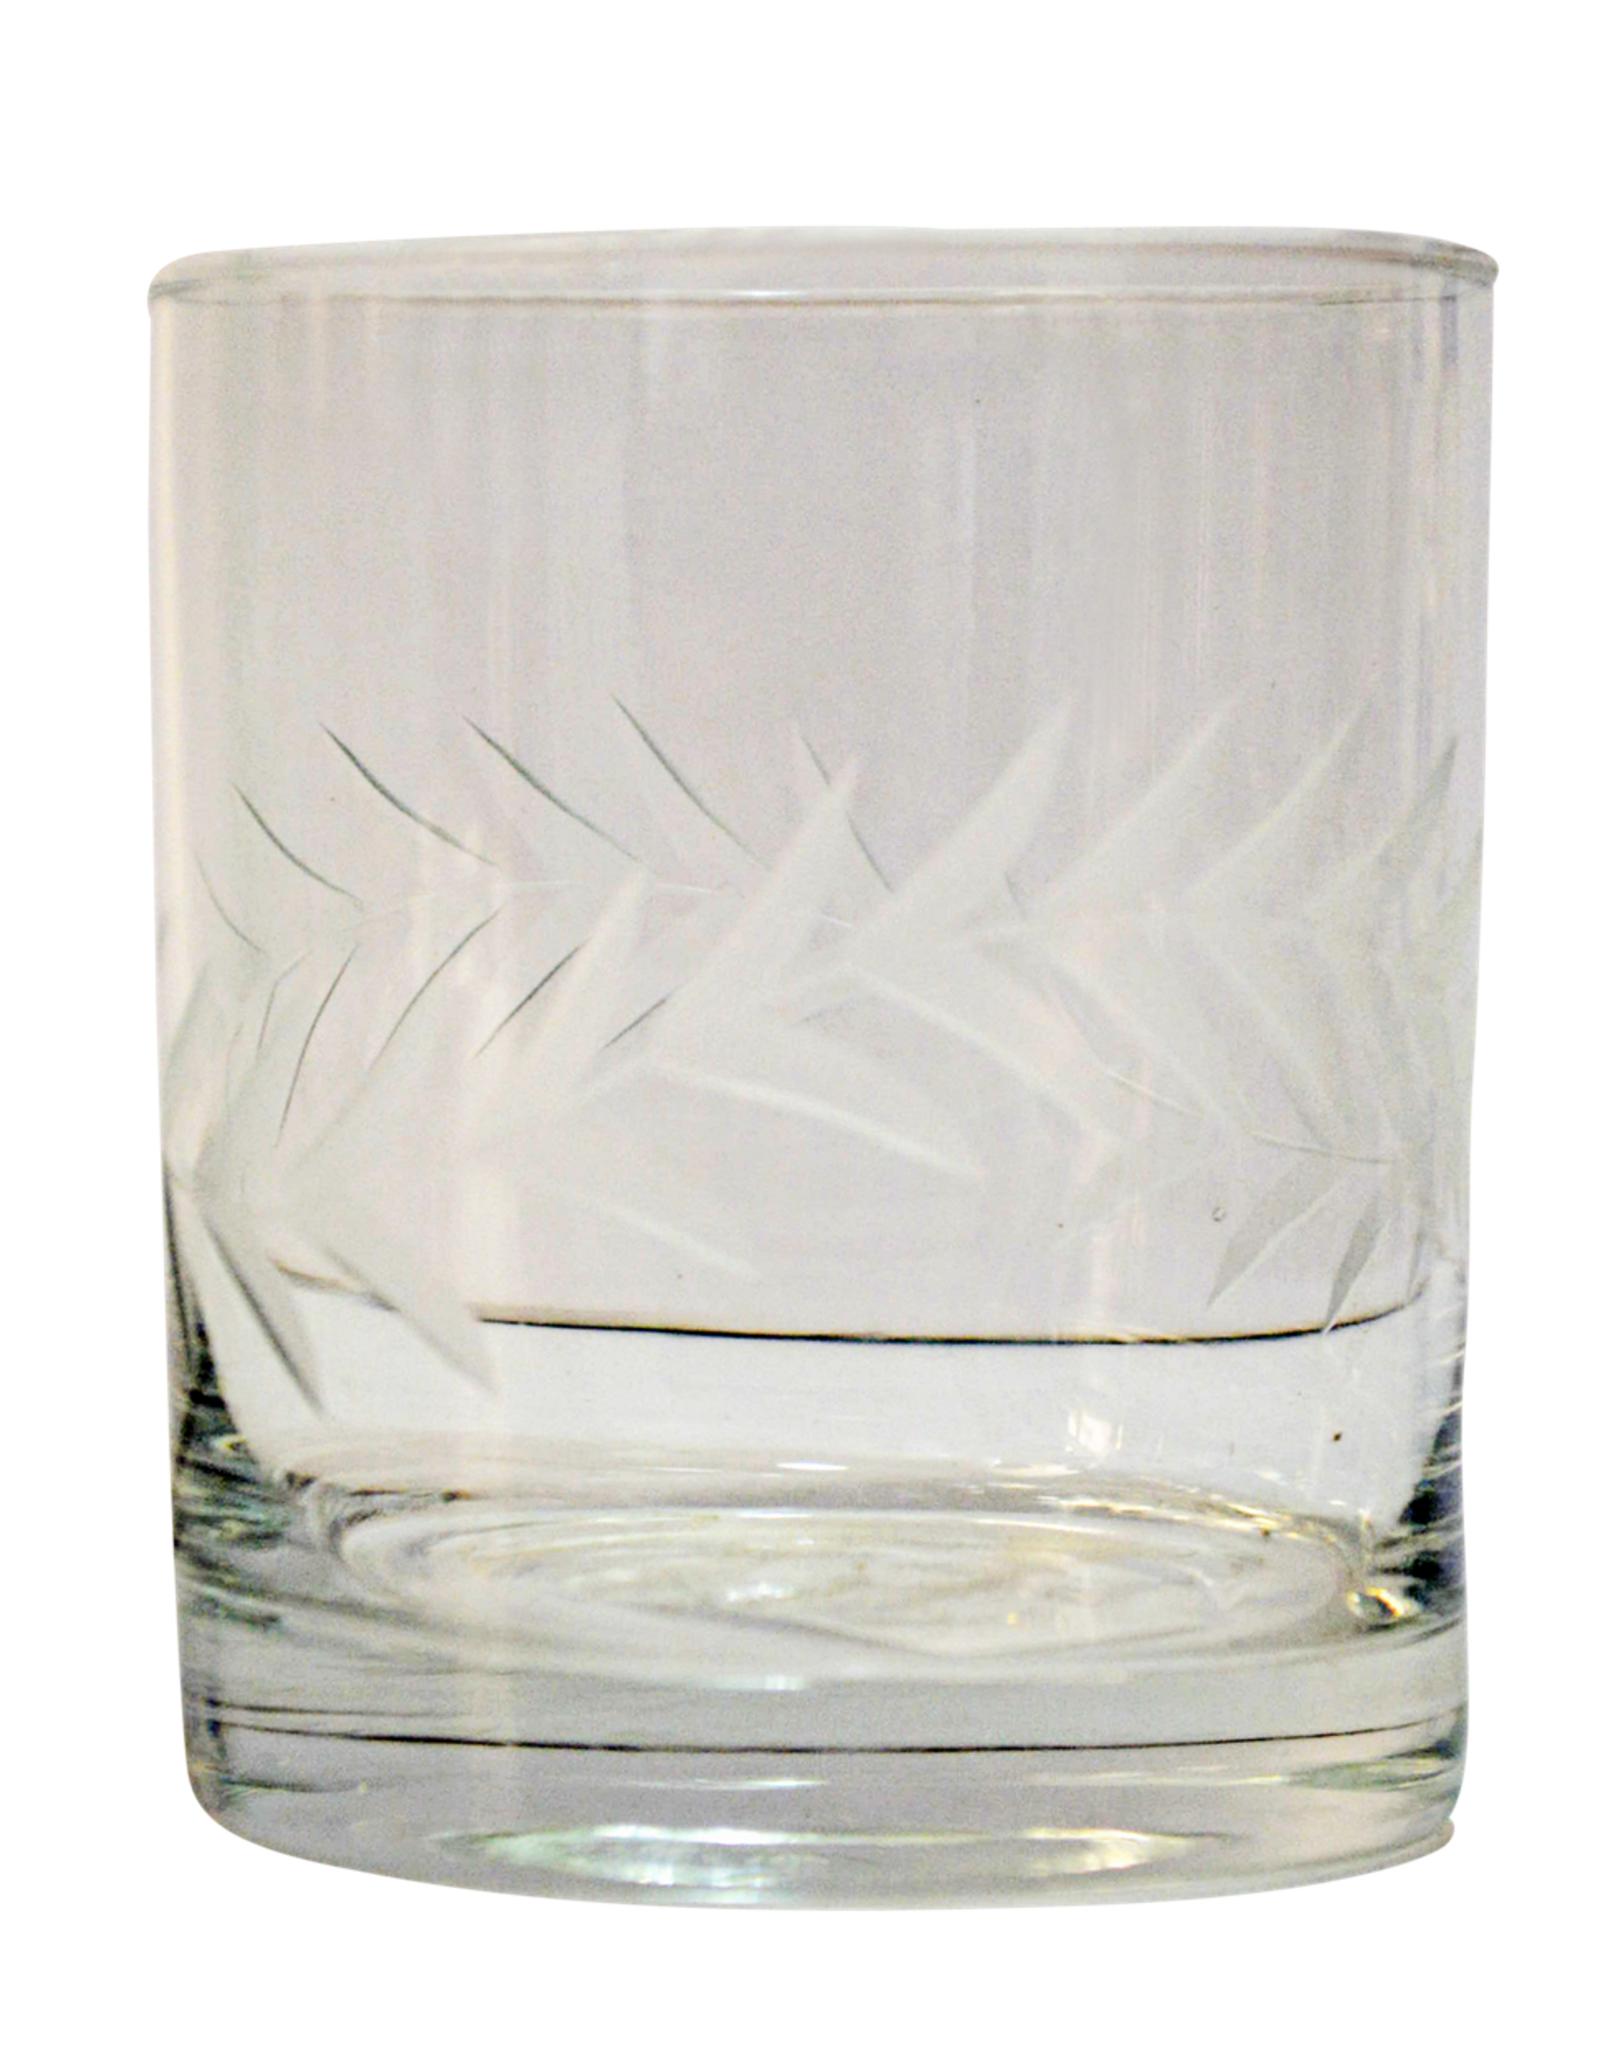 BIDK HOME GLASS DRINKING TUMBLER LAUREL CLEAR